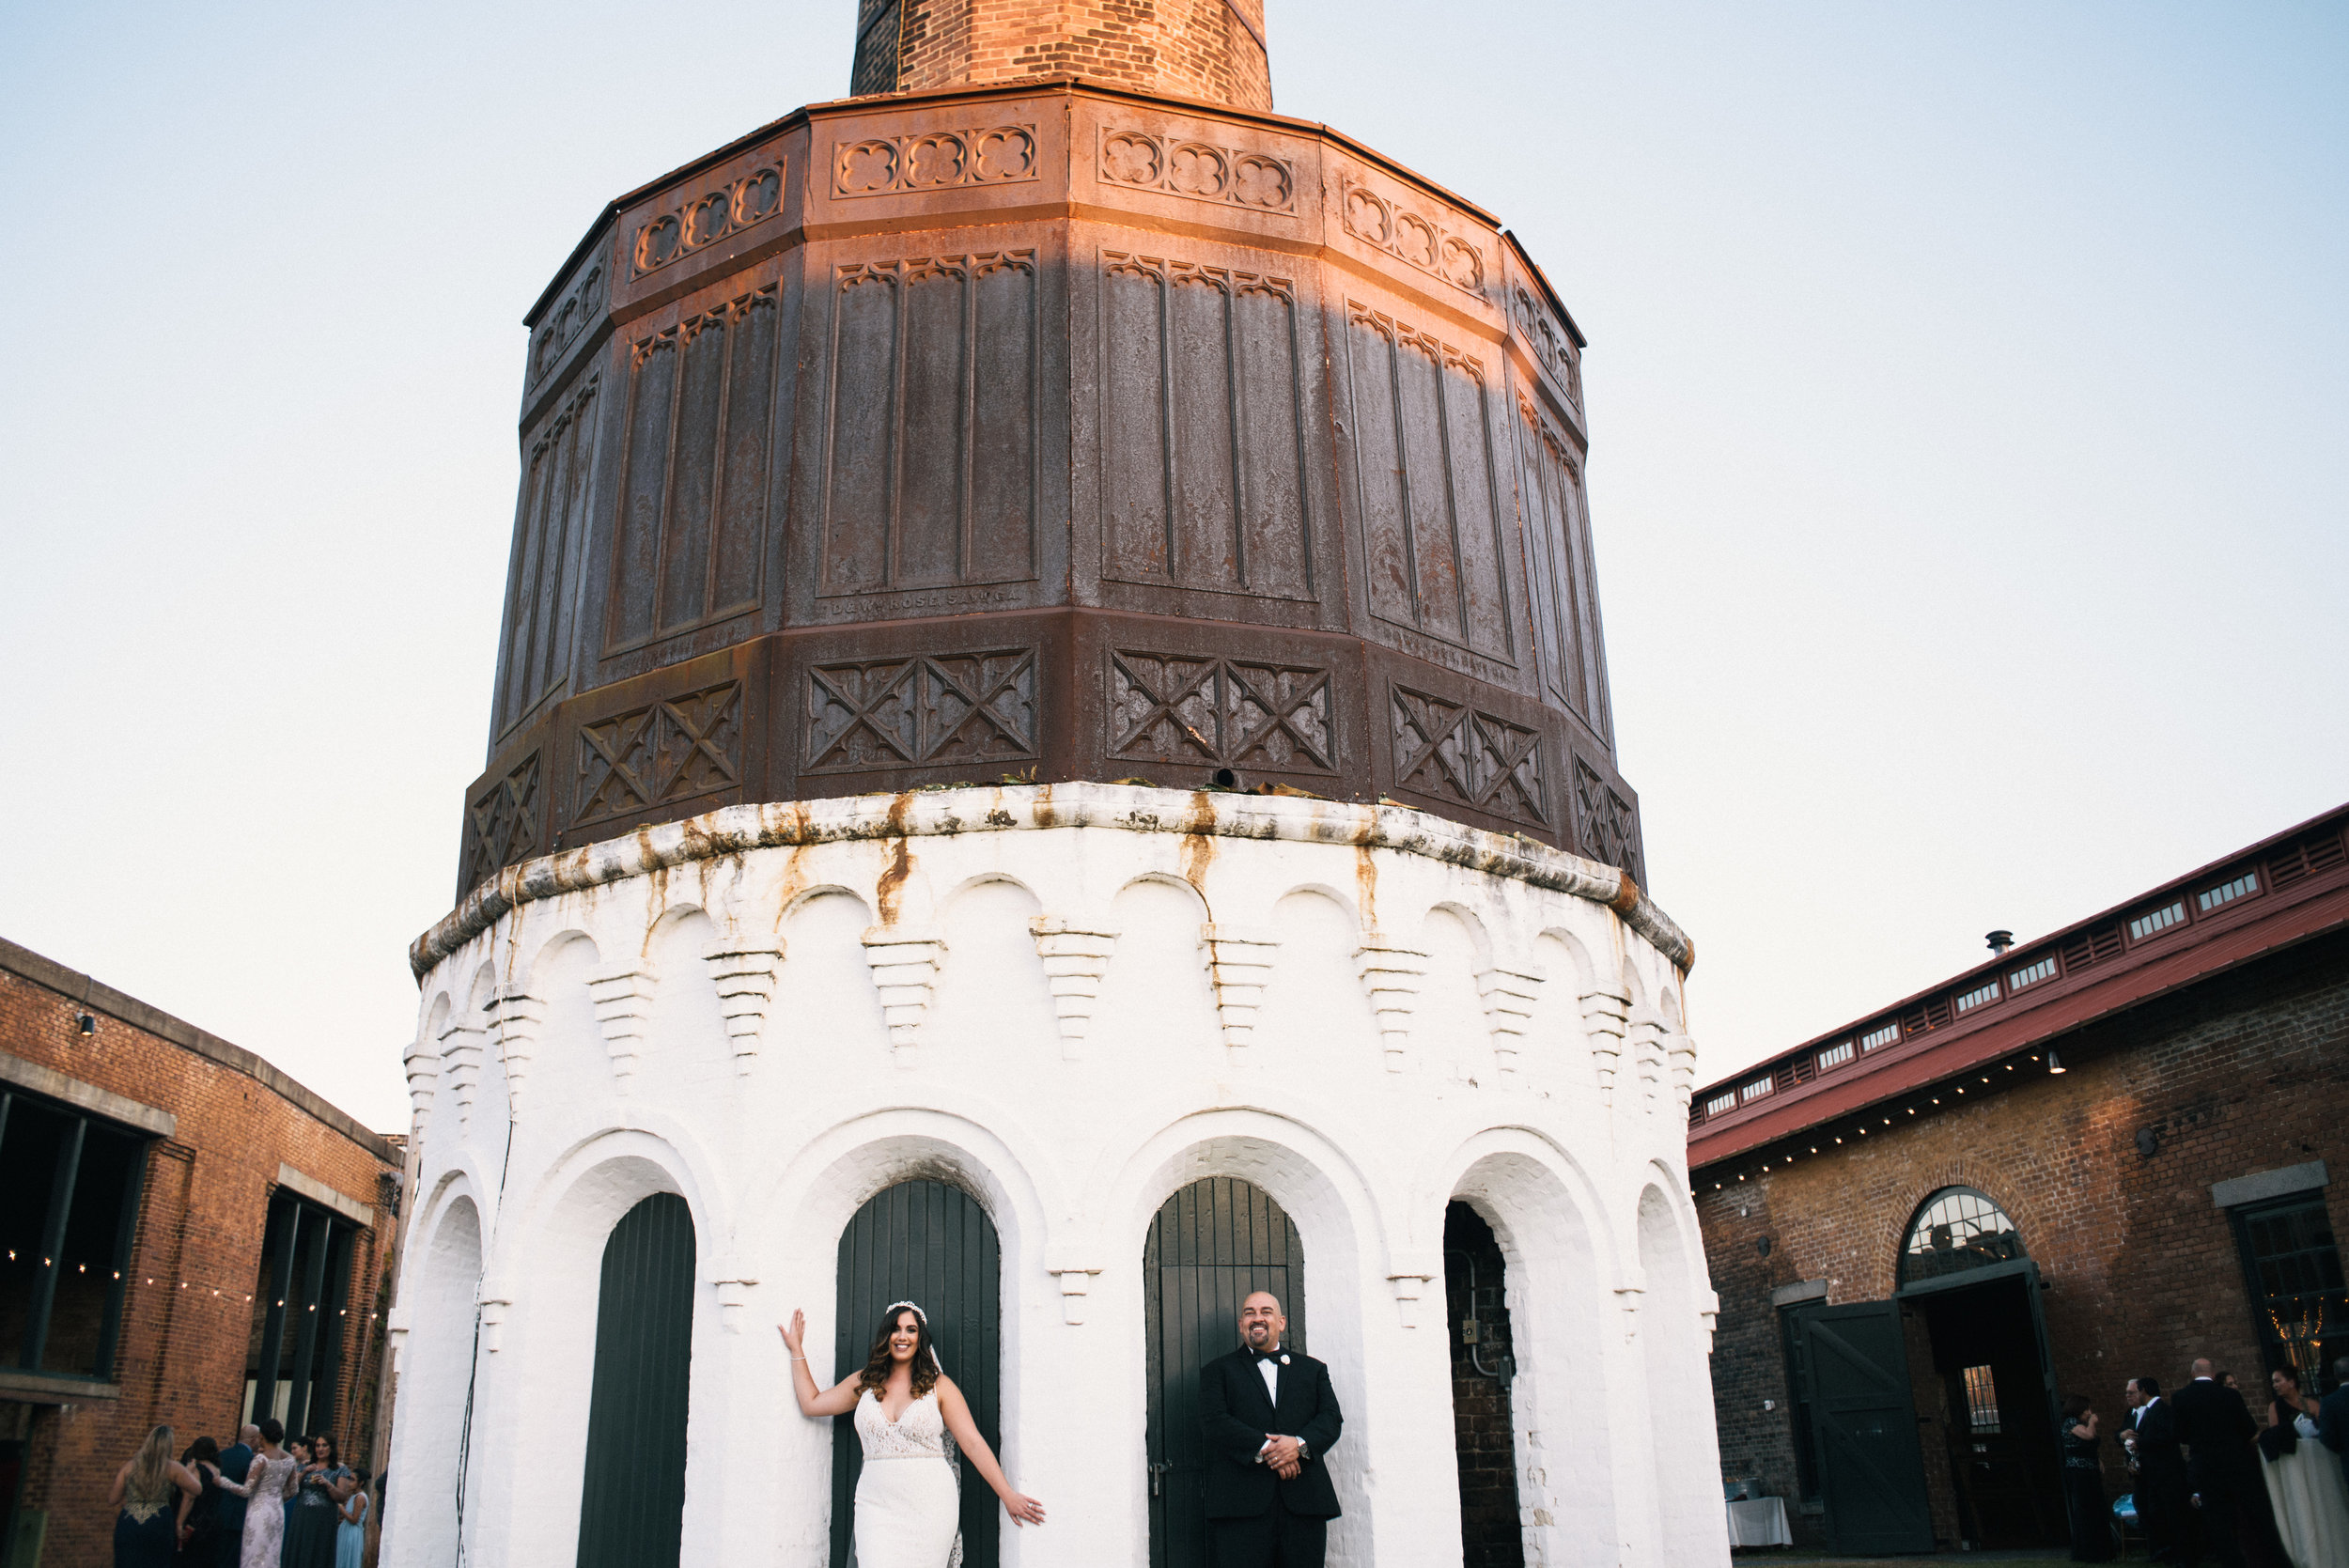 Iggy-and-yesenia-savannah-railroad-museum-wedding-meg-hill-photo- (705 of 1037).jpg